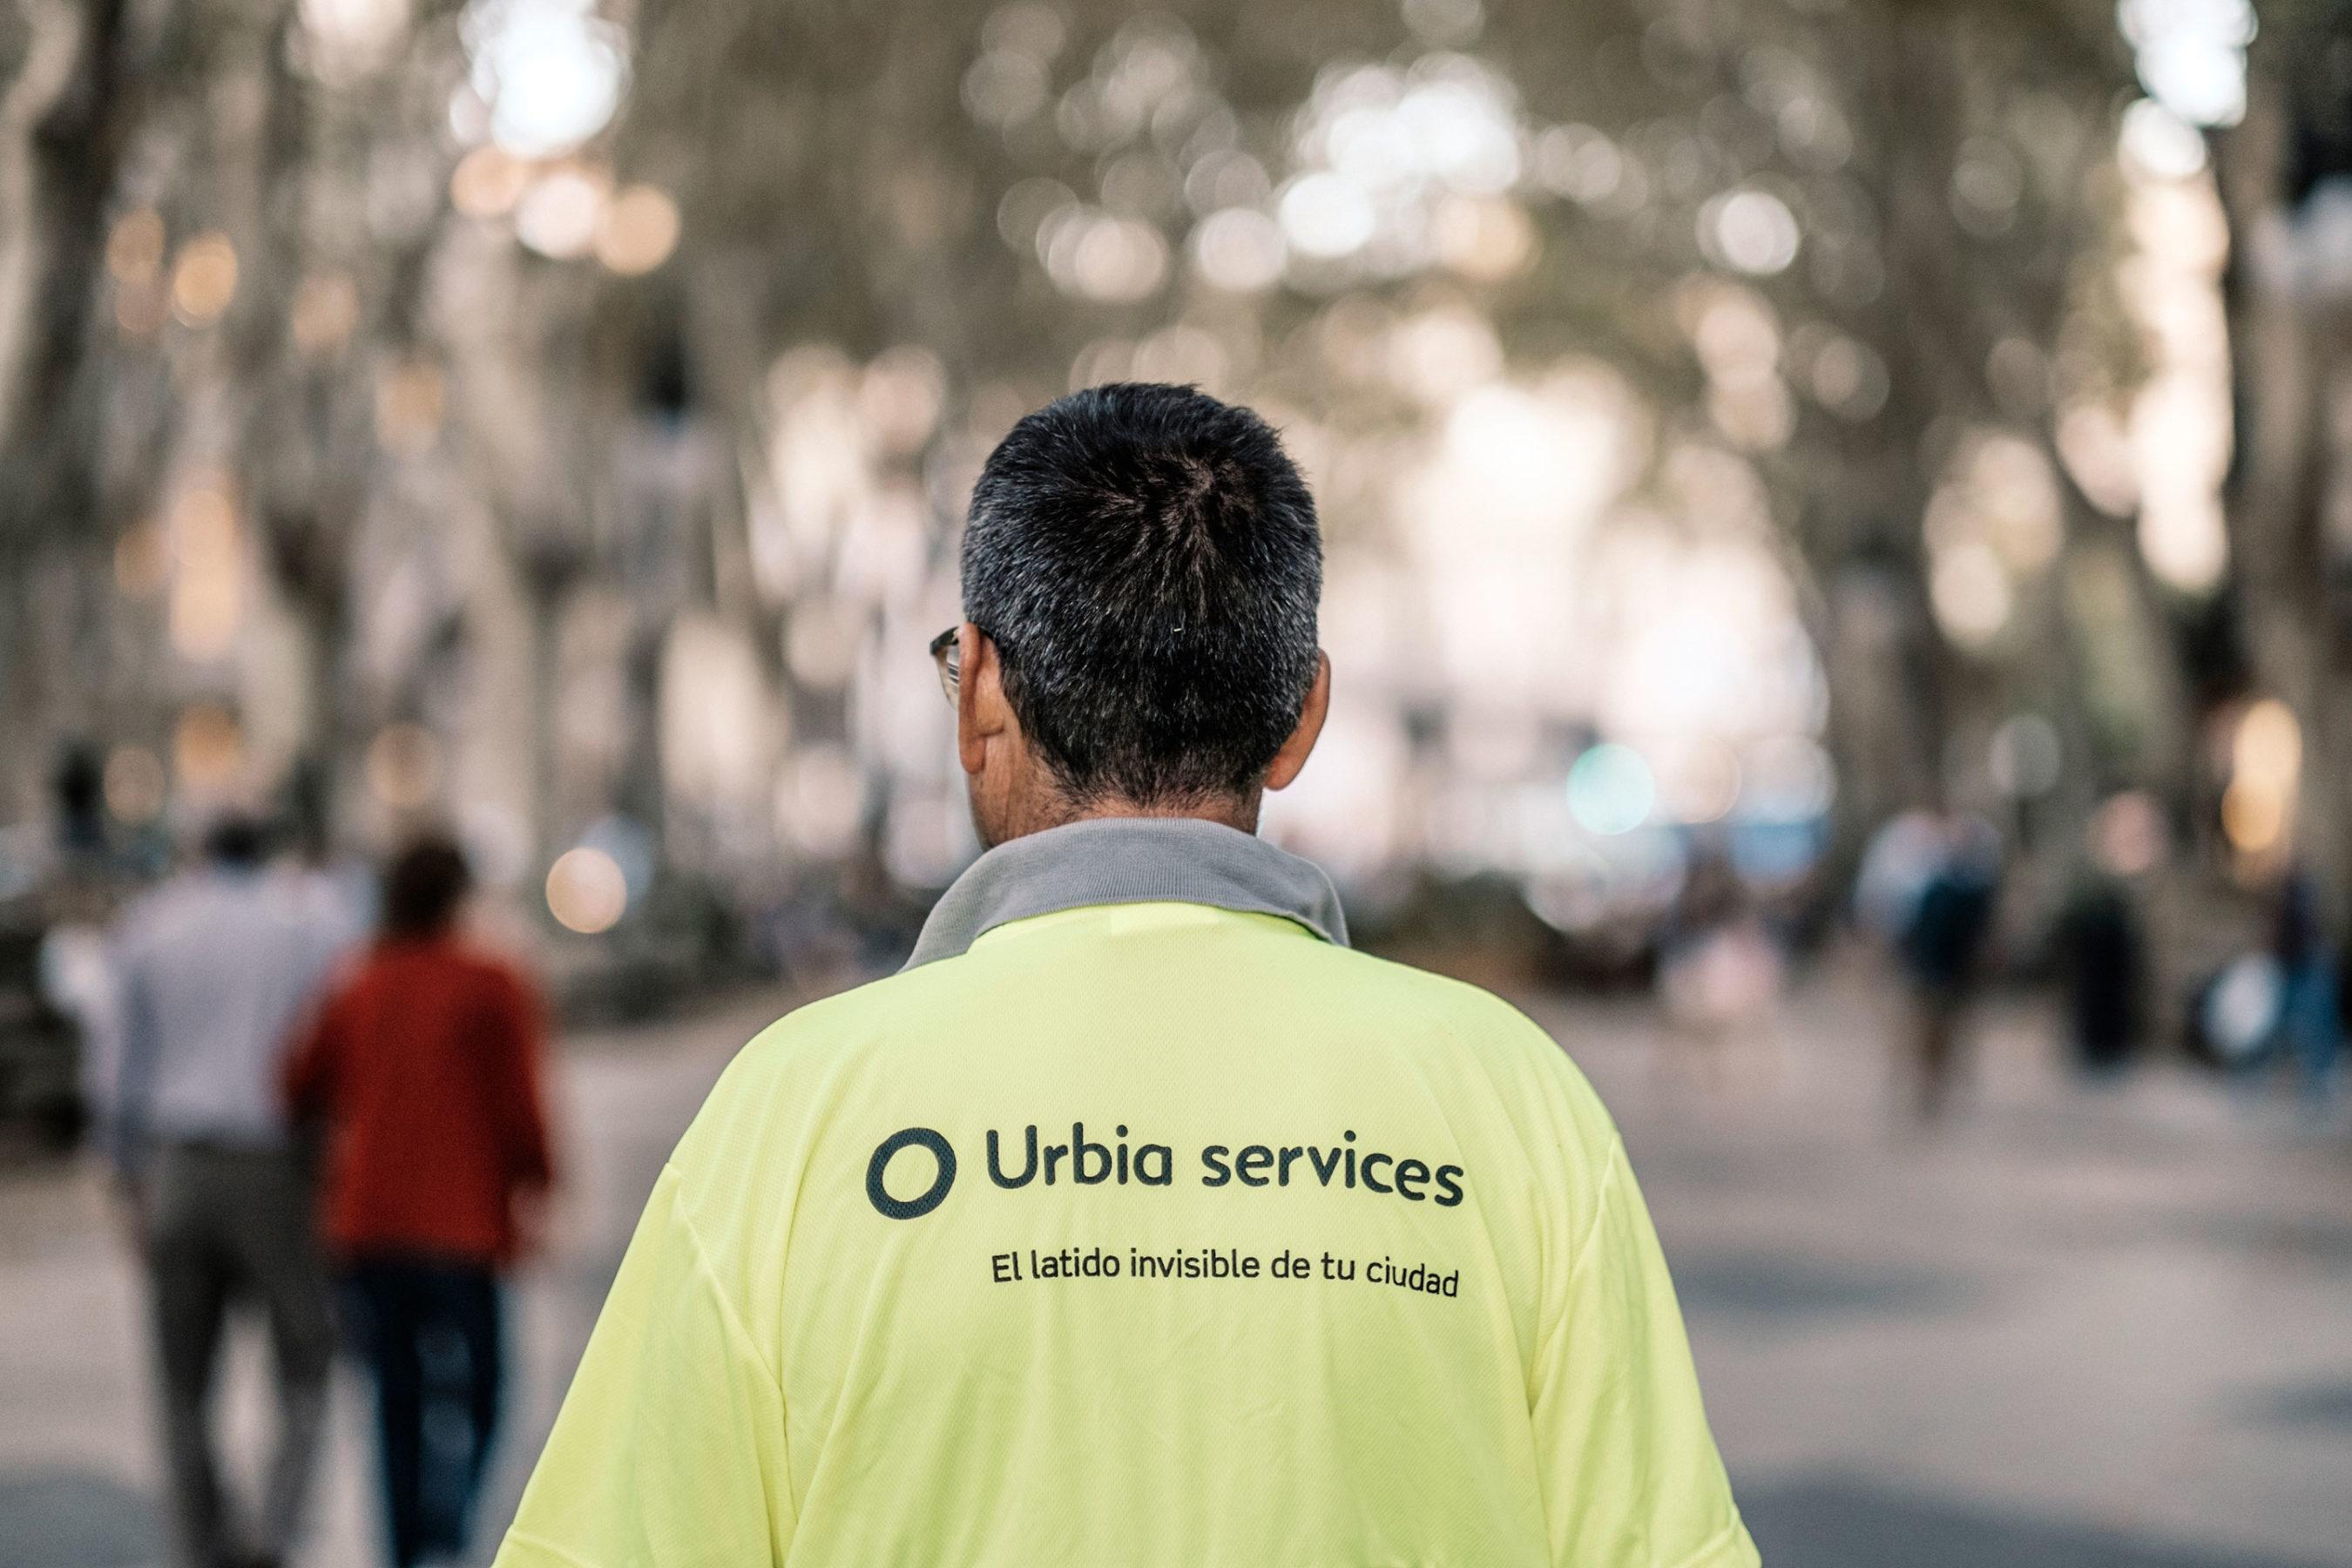 Urbia services photoshooting detalle